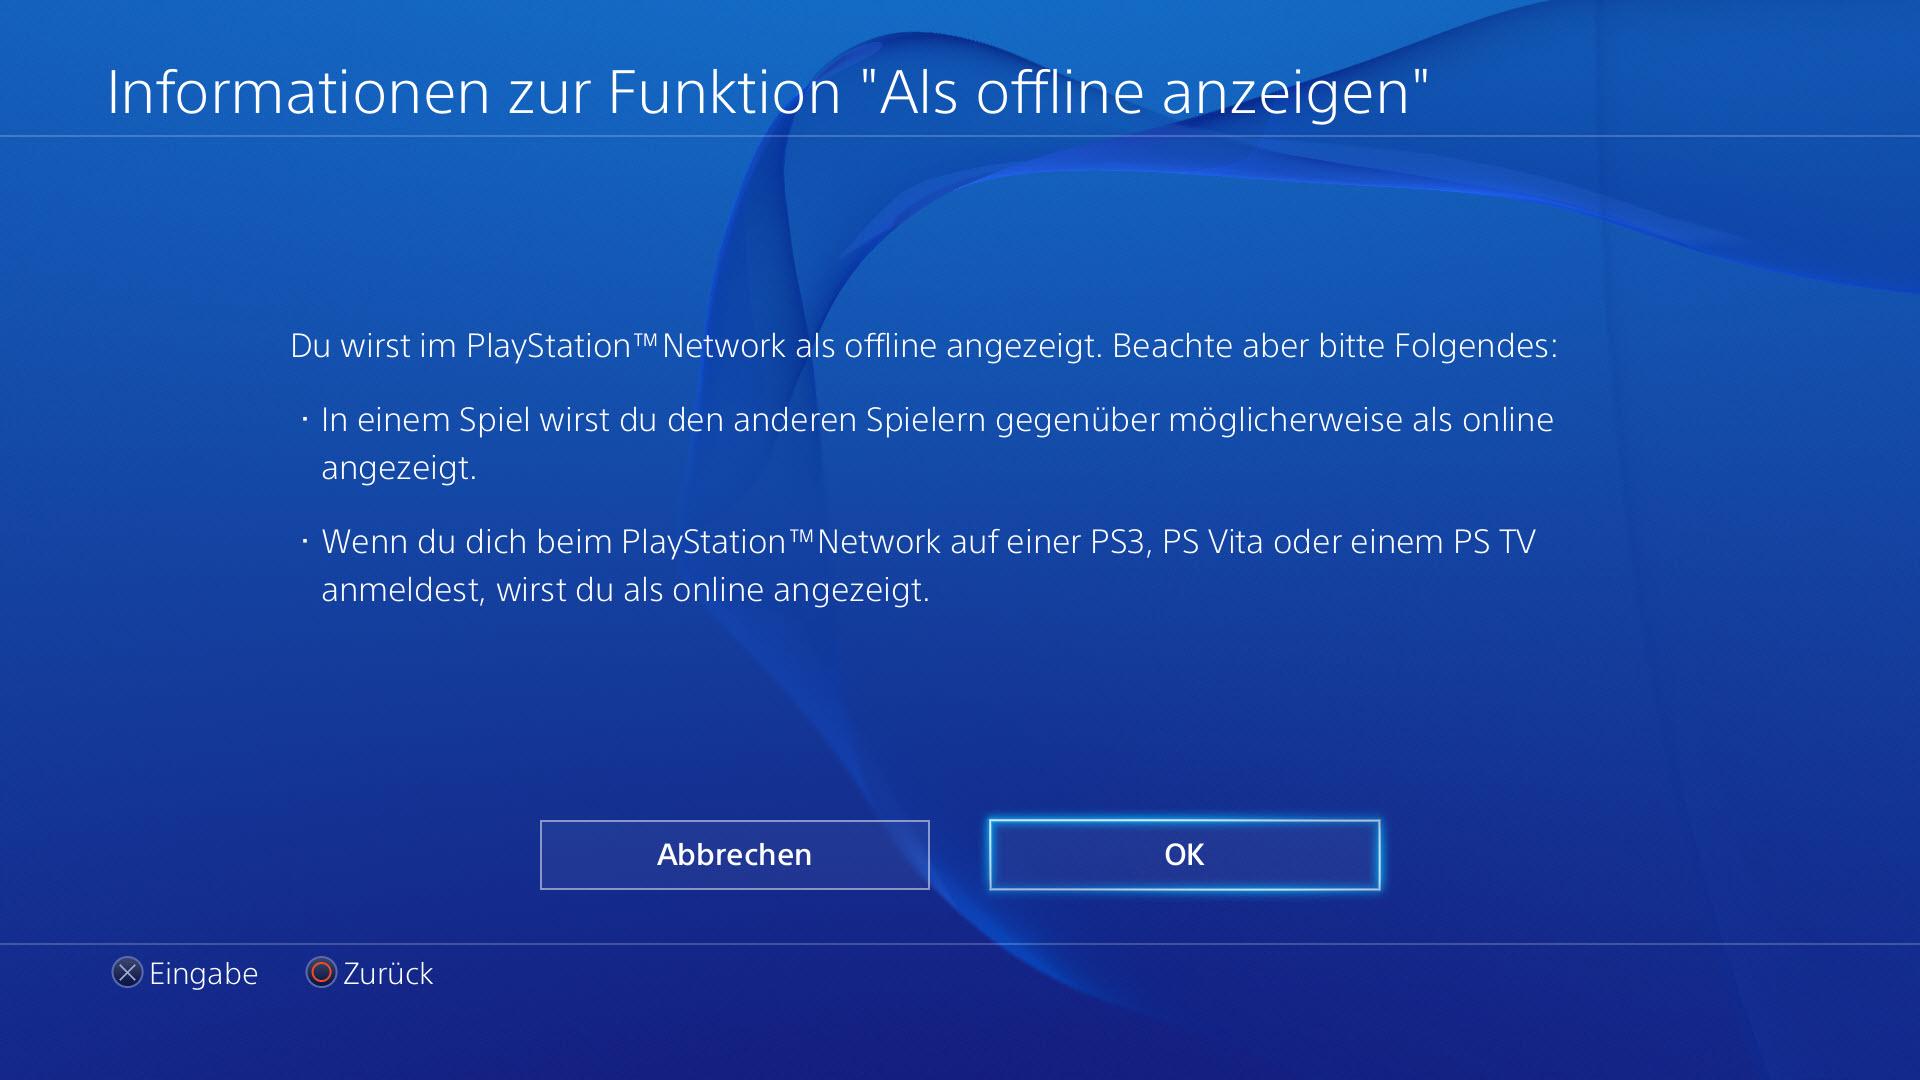 PS4 3.50